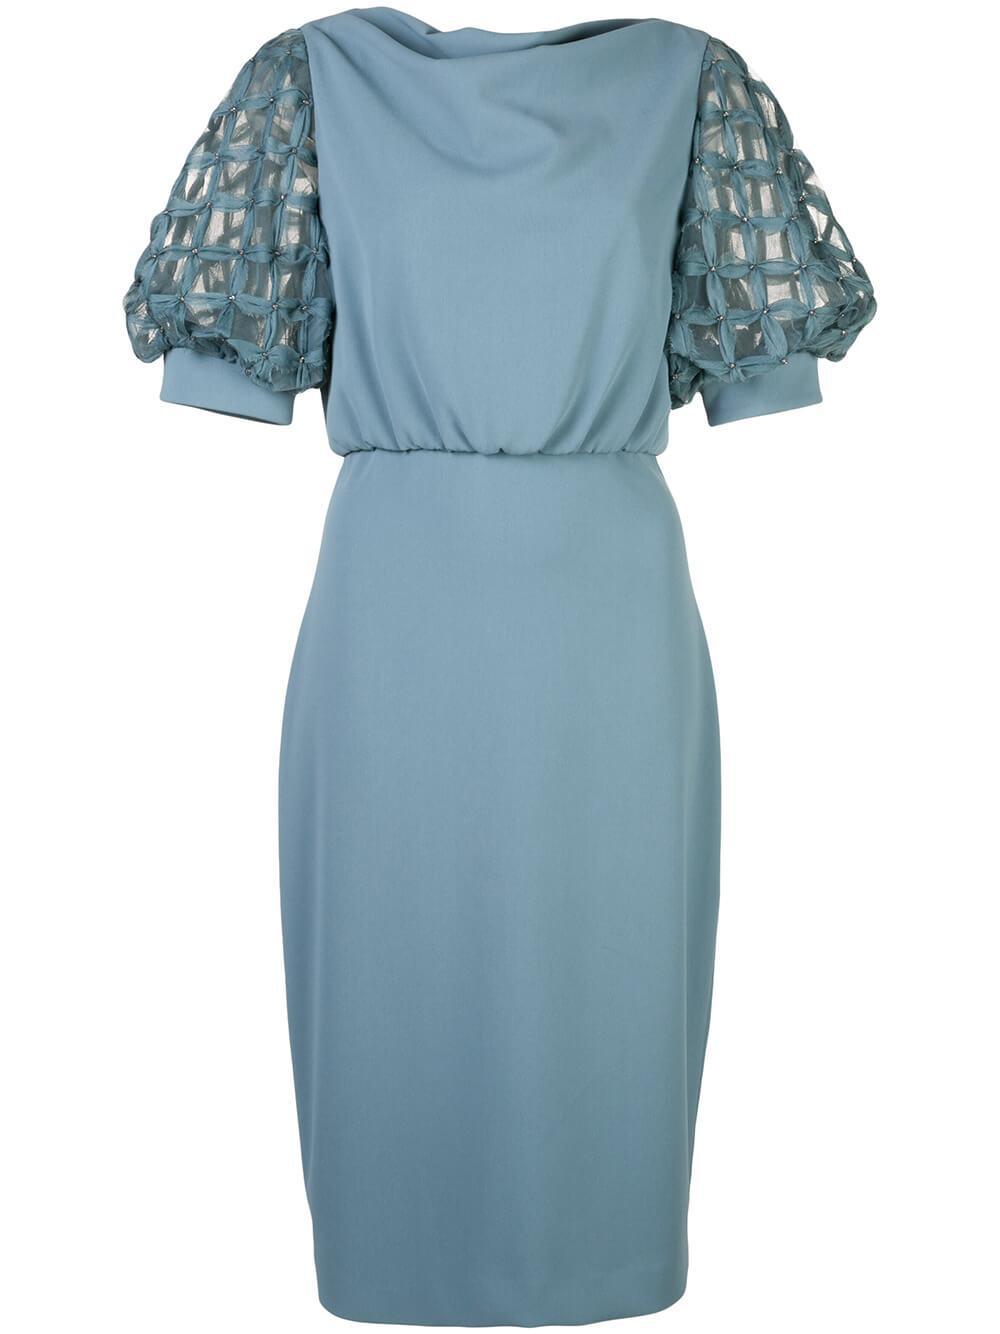 Embellished Puff Sleeve Cocktail Dress Item # SC2481